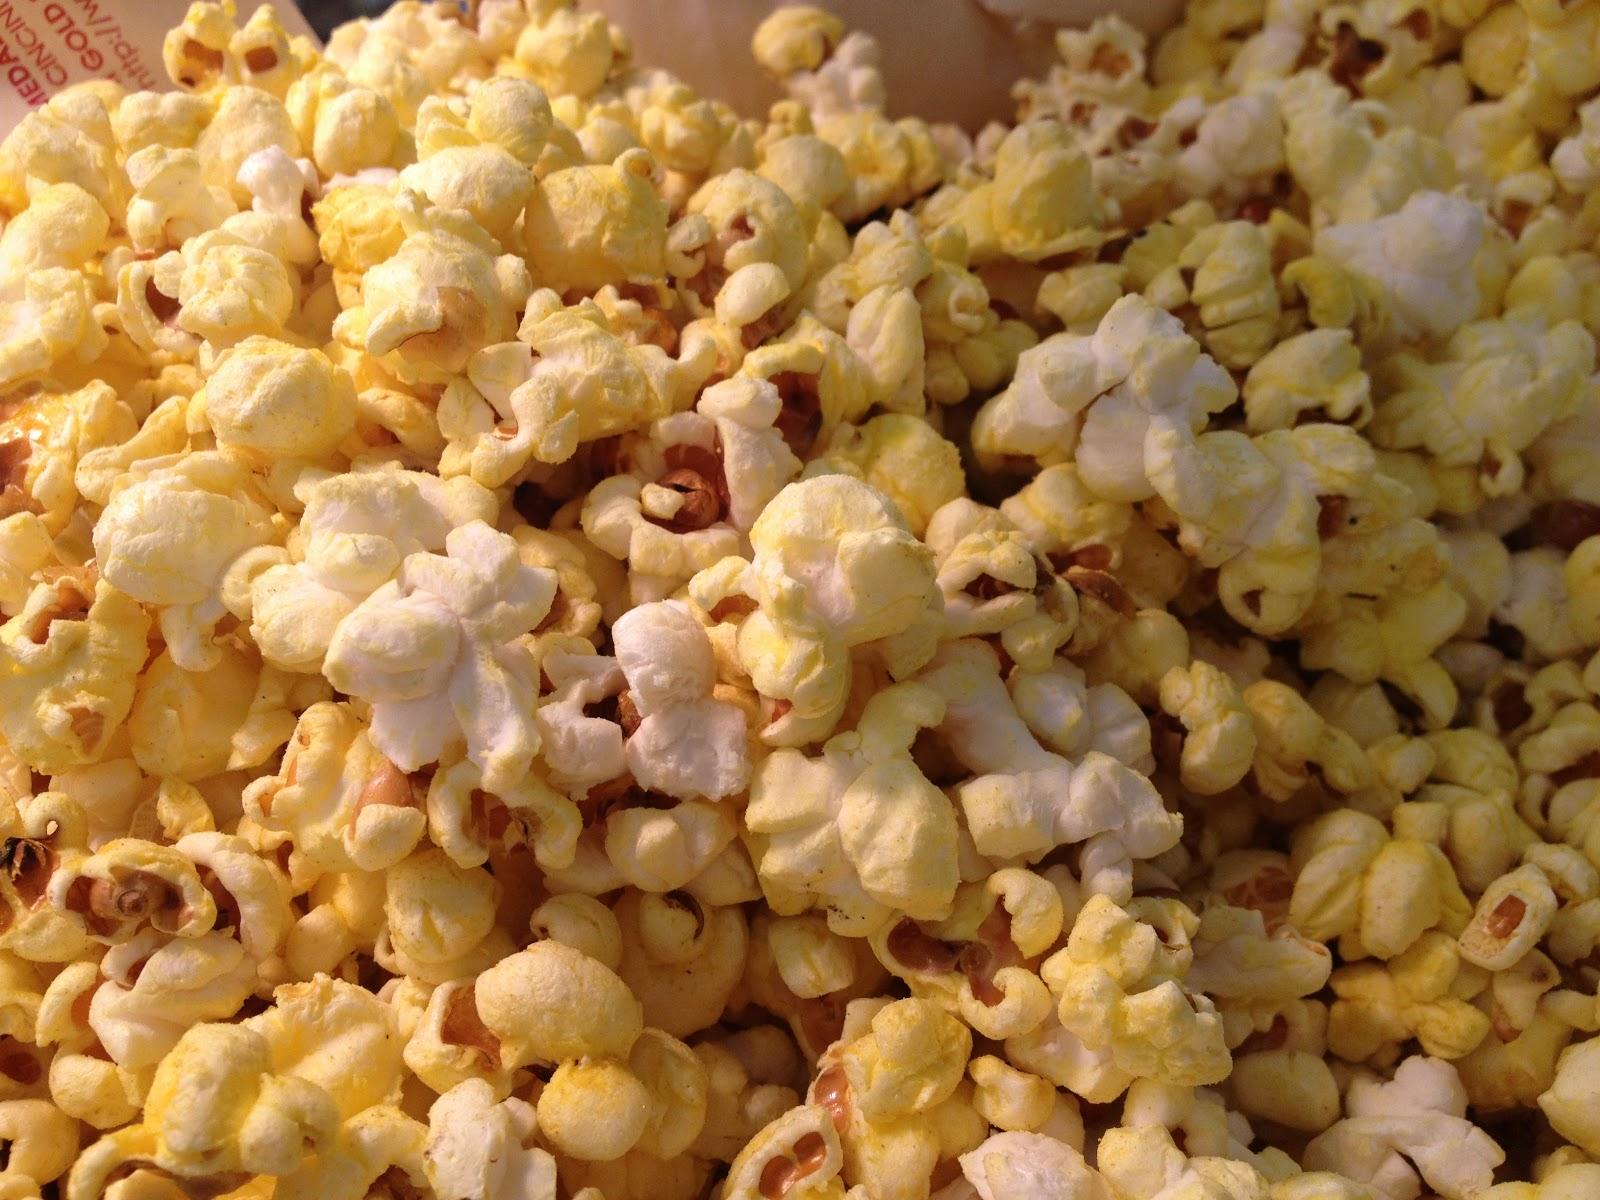 Popcorn Popping Freshly popped popcorn for